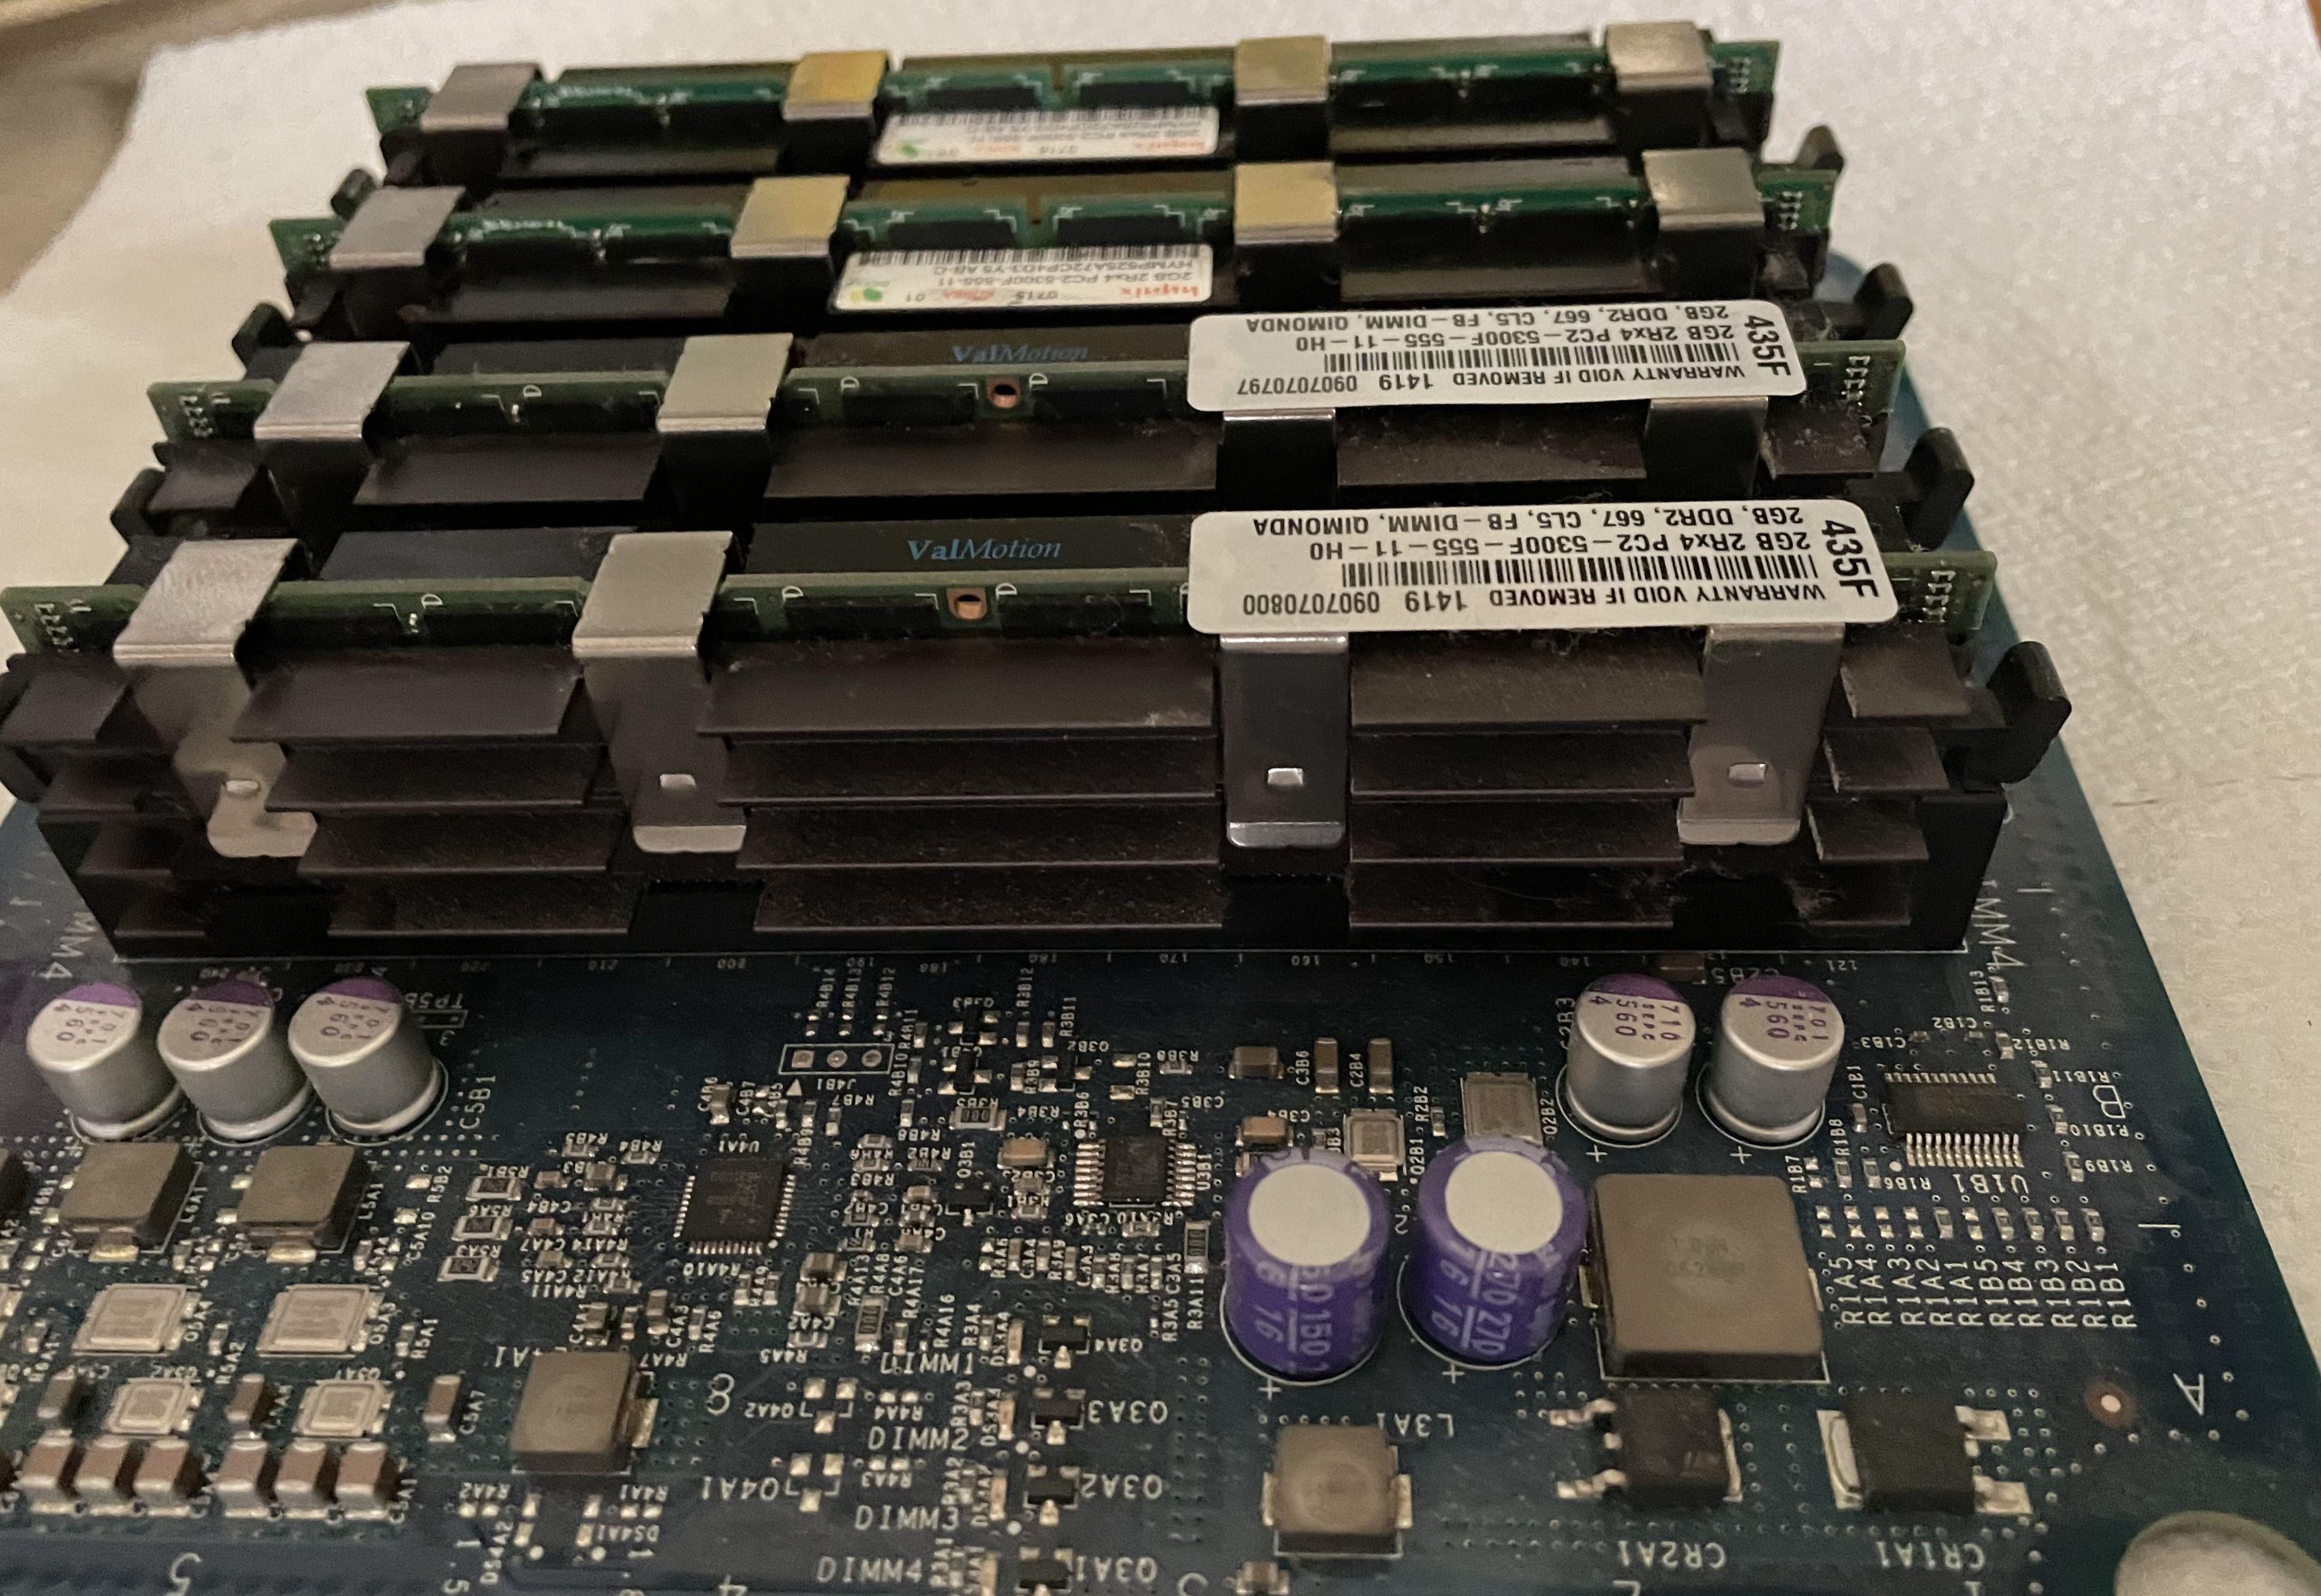 AAC06D8E-ECF0-4368-A2A8-F6BE144ED25E.jpeg